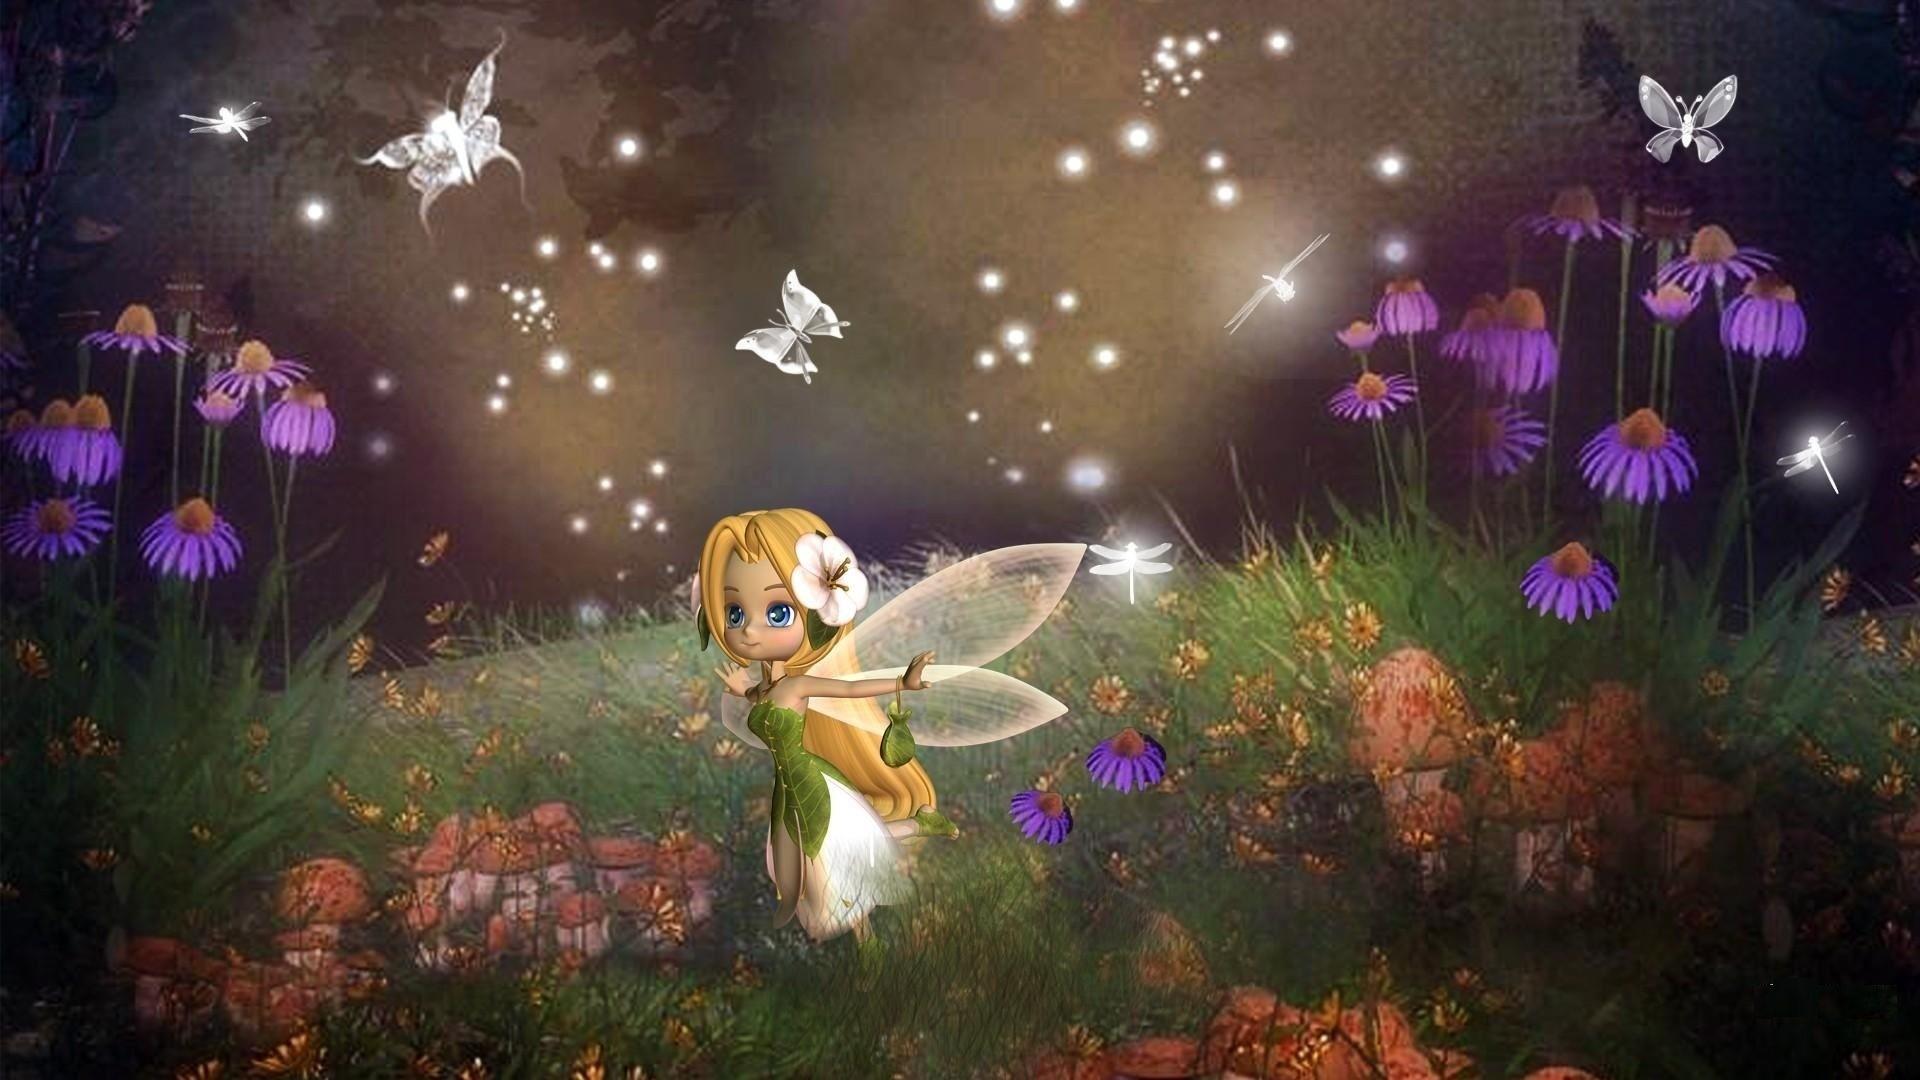 Fairy Wallpaper theme